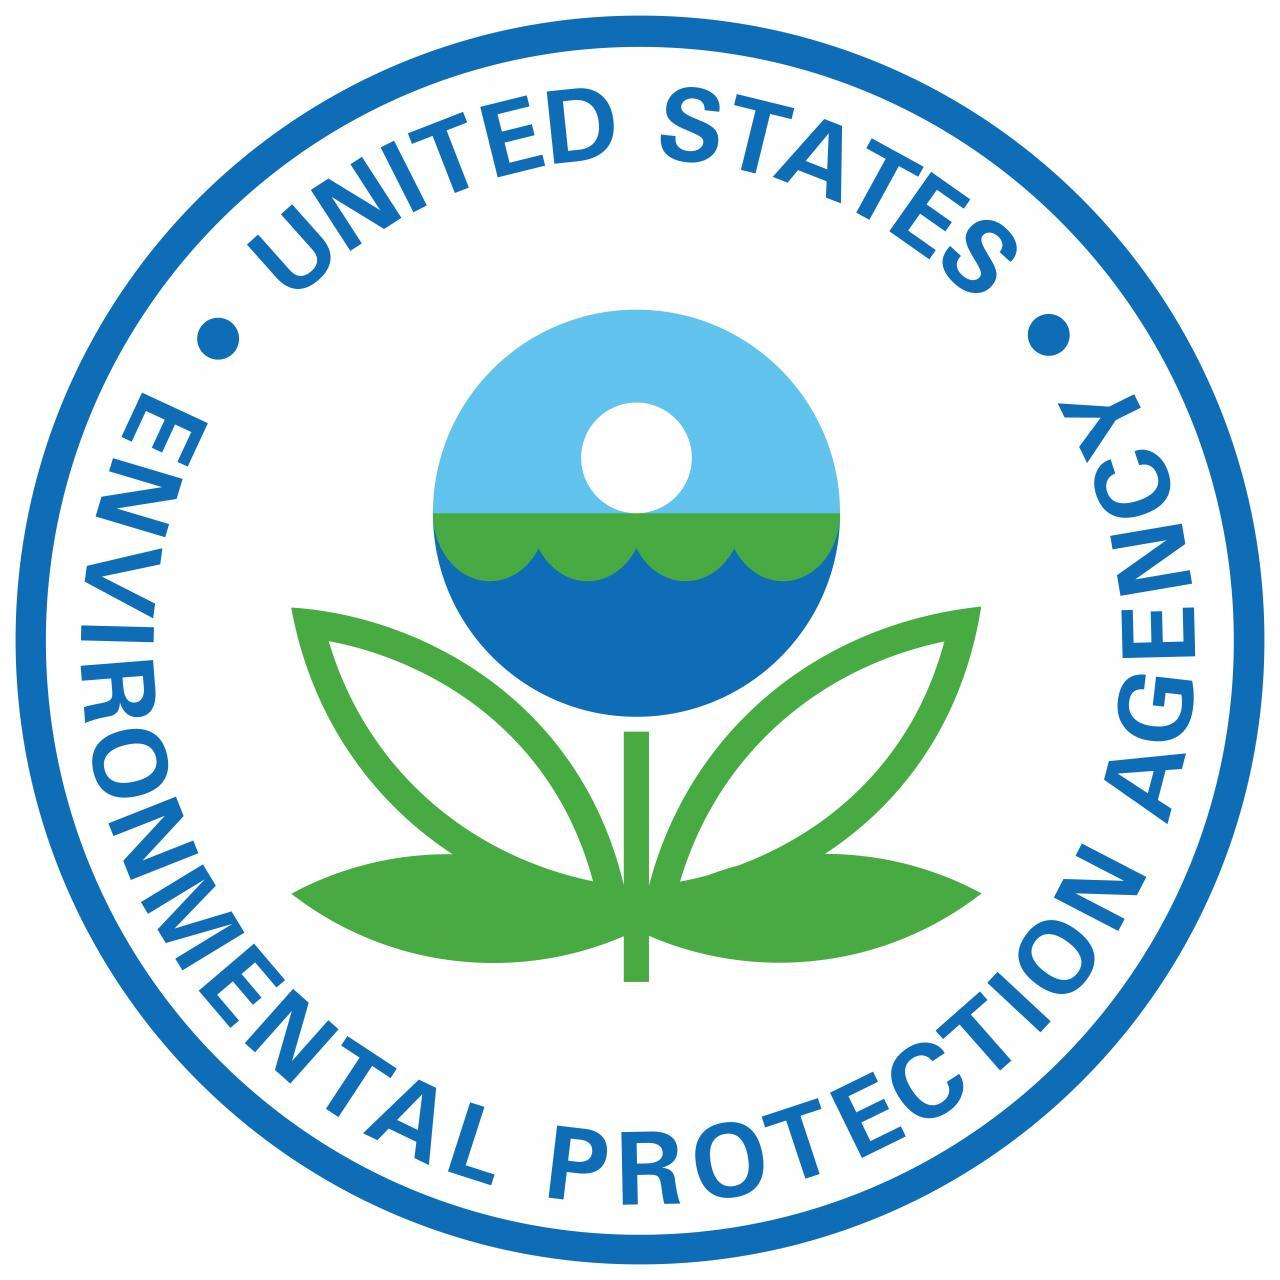 EPA considering Superfund status for Saint-Gobain site